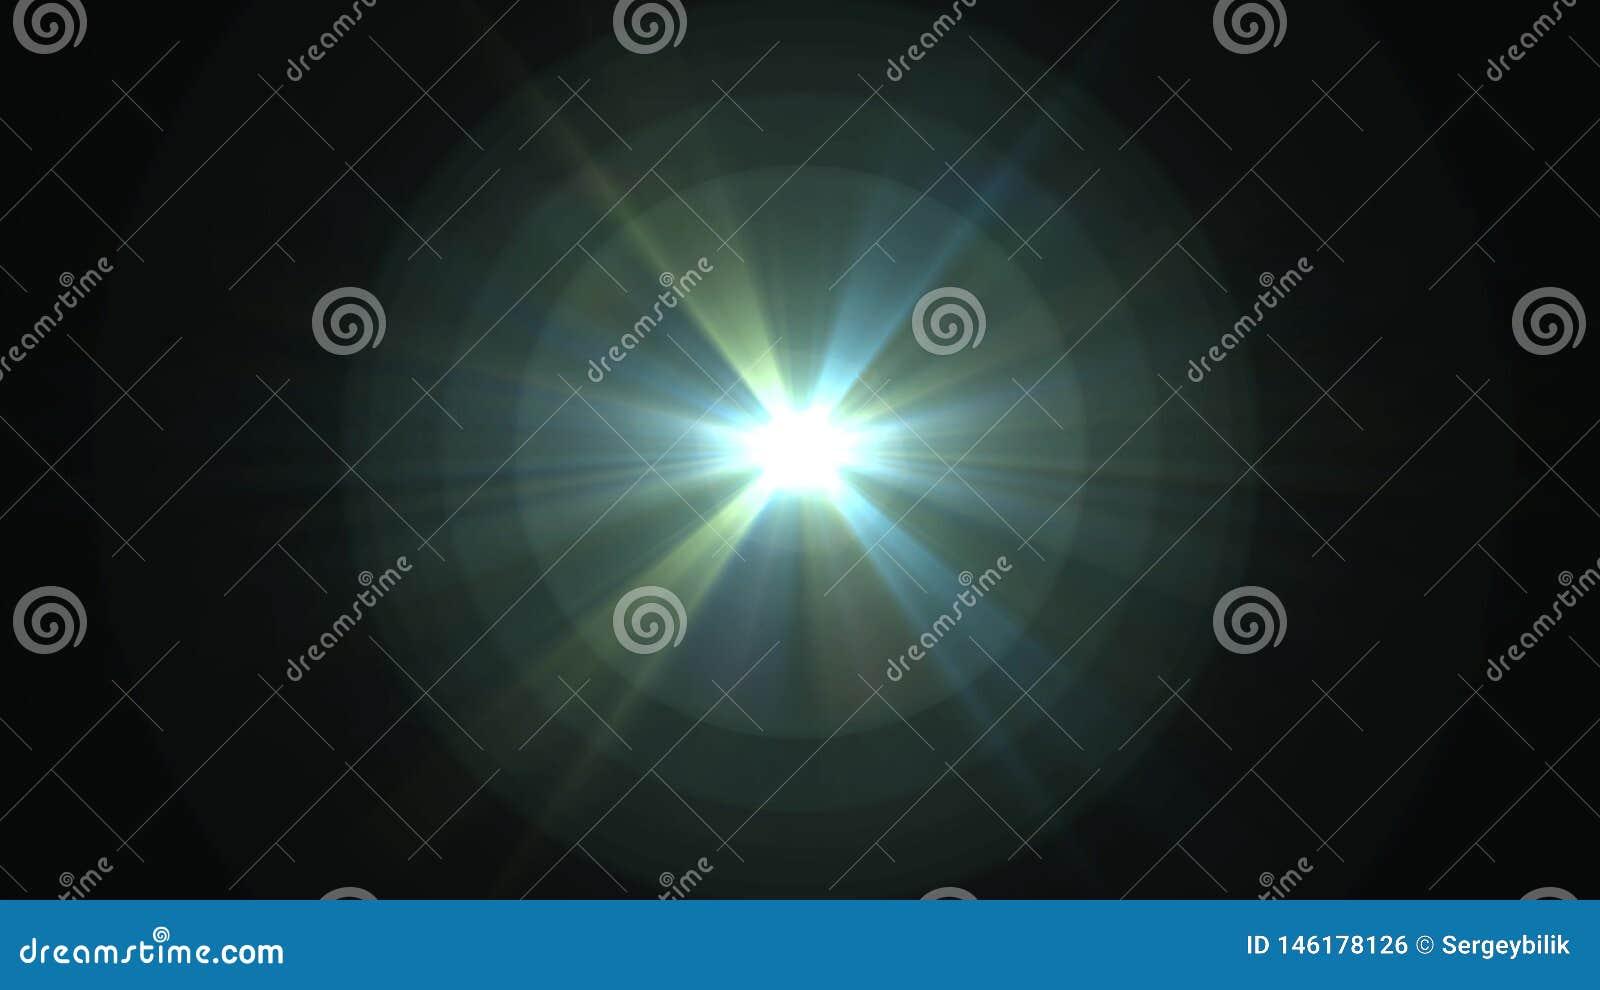 Central star shine optical lens flares shiny bokeh illustration art background new natural lighting lamp rays effect